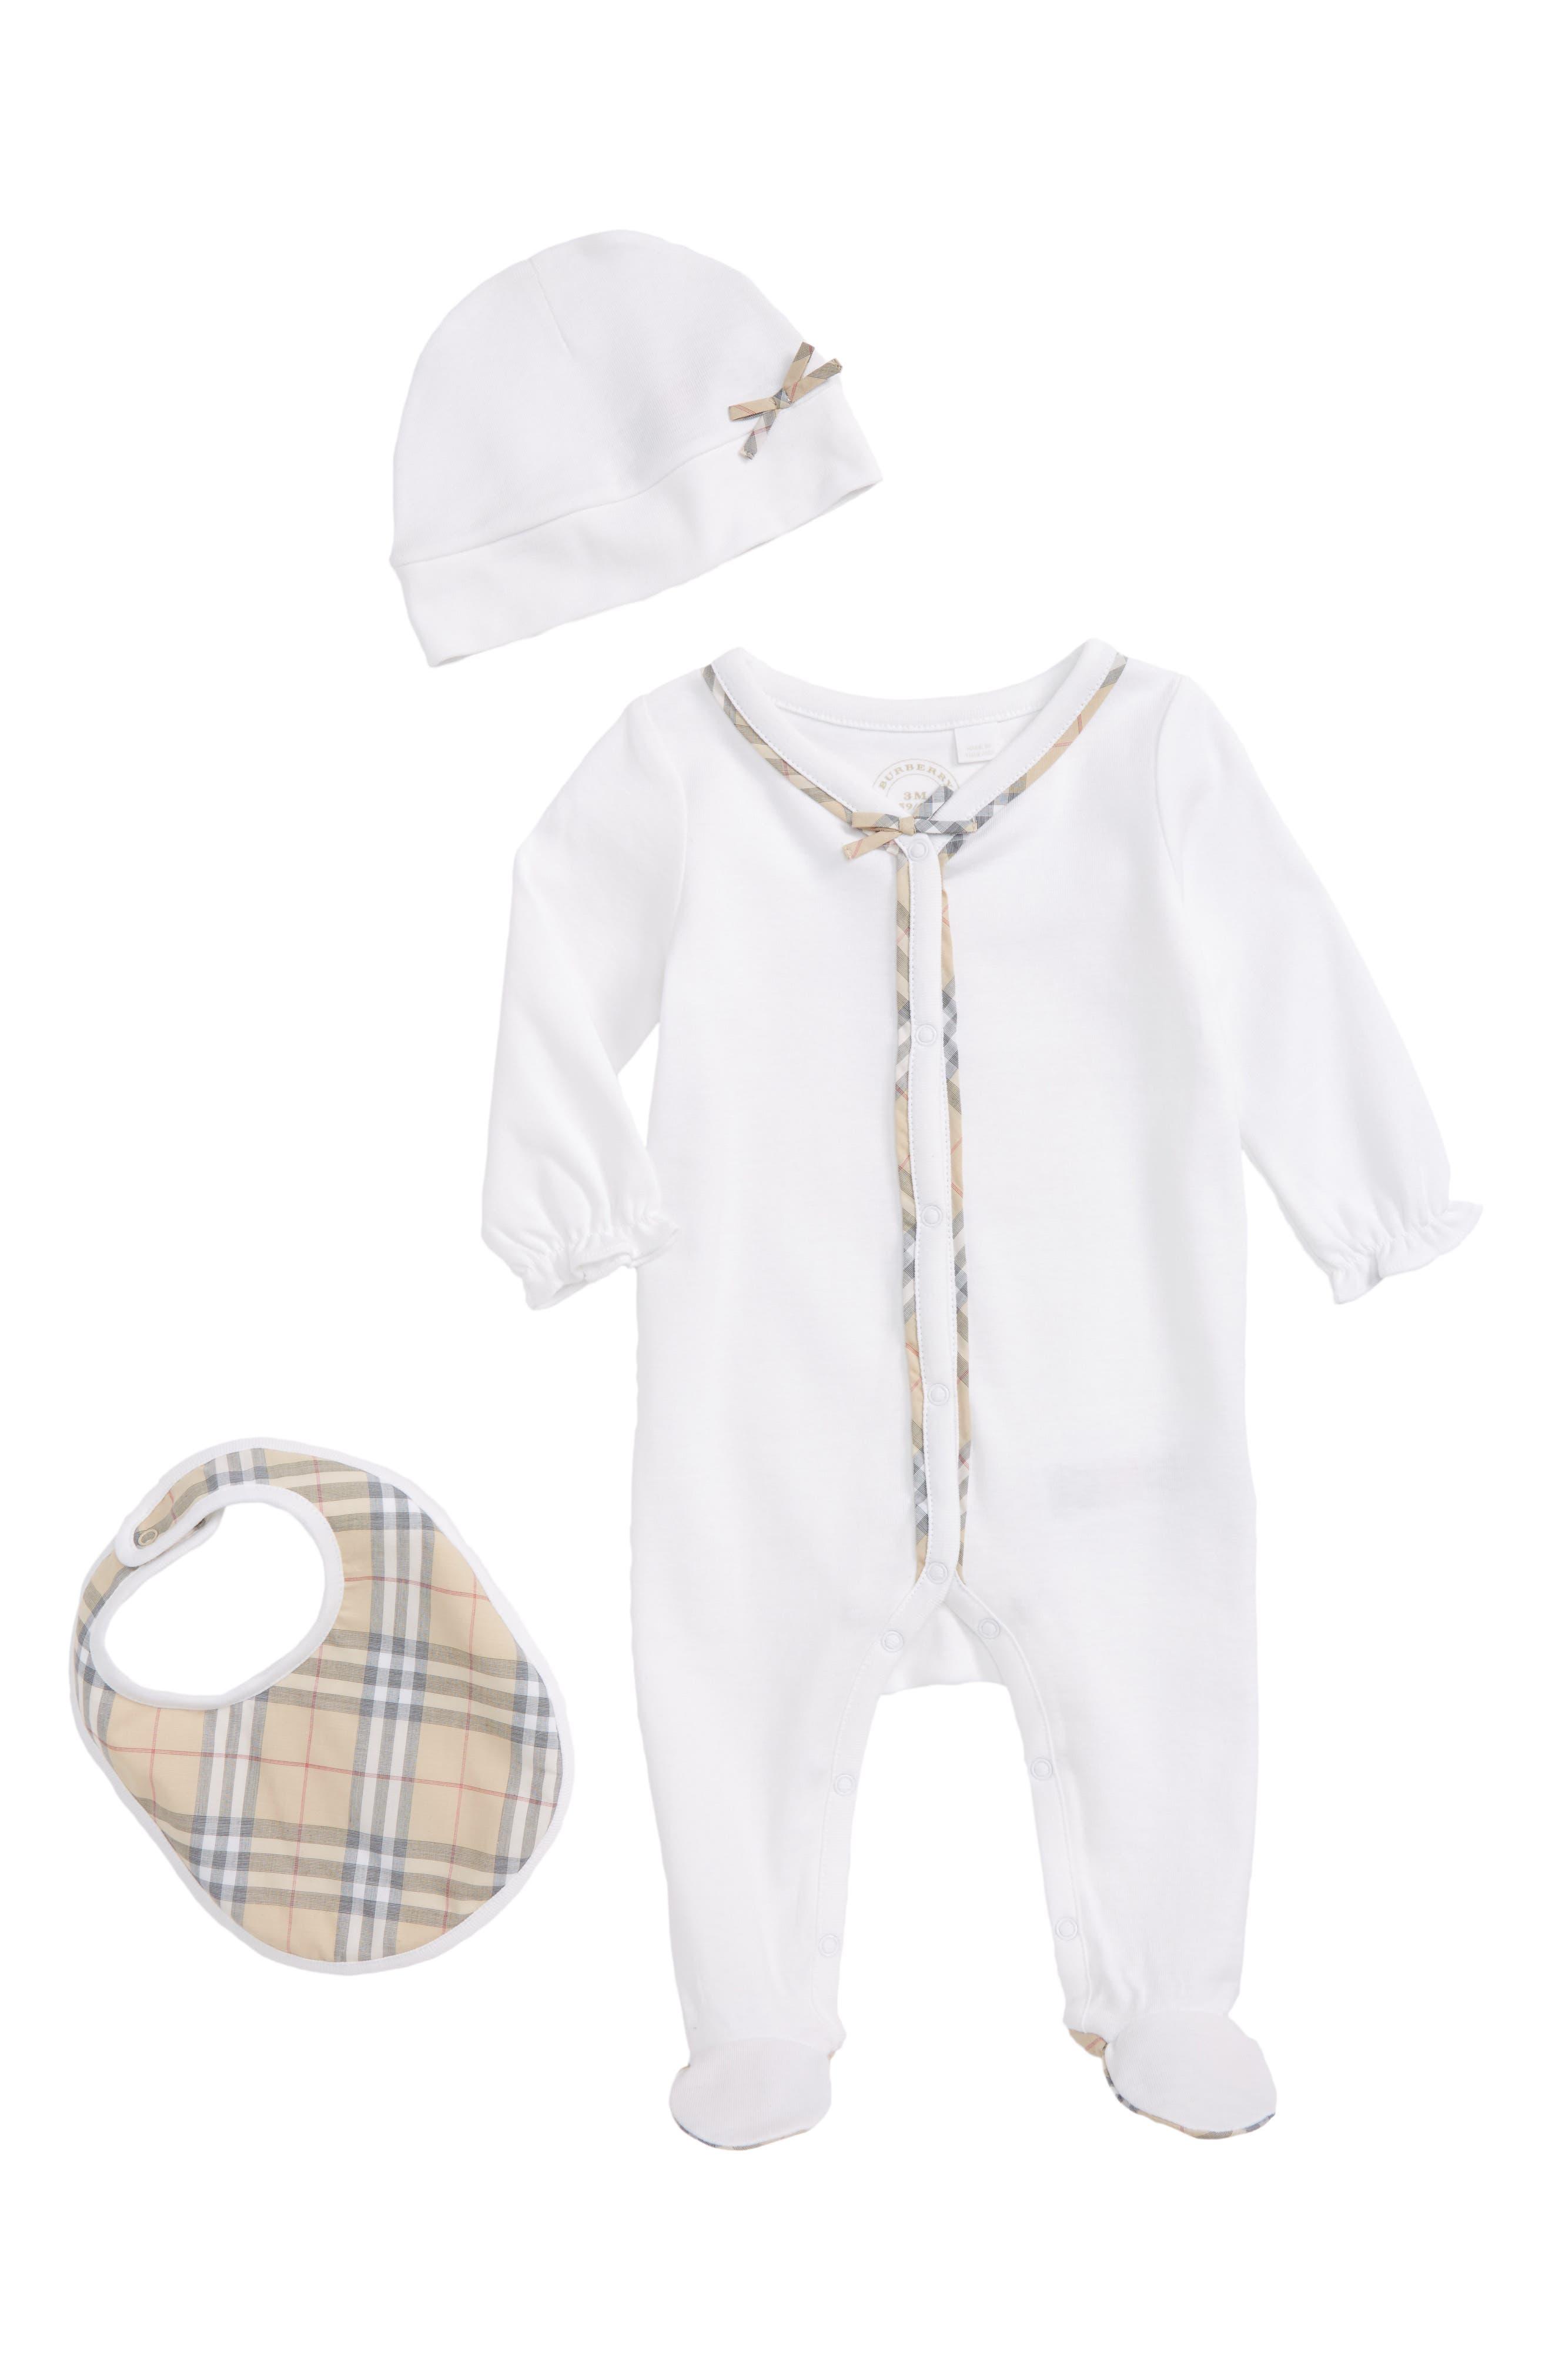 Main Image - Burberry Jacey Footie, Hat & Bib Set (Baby Girls)